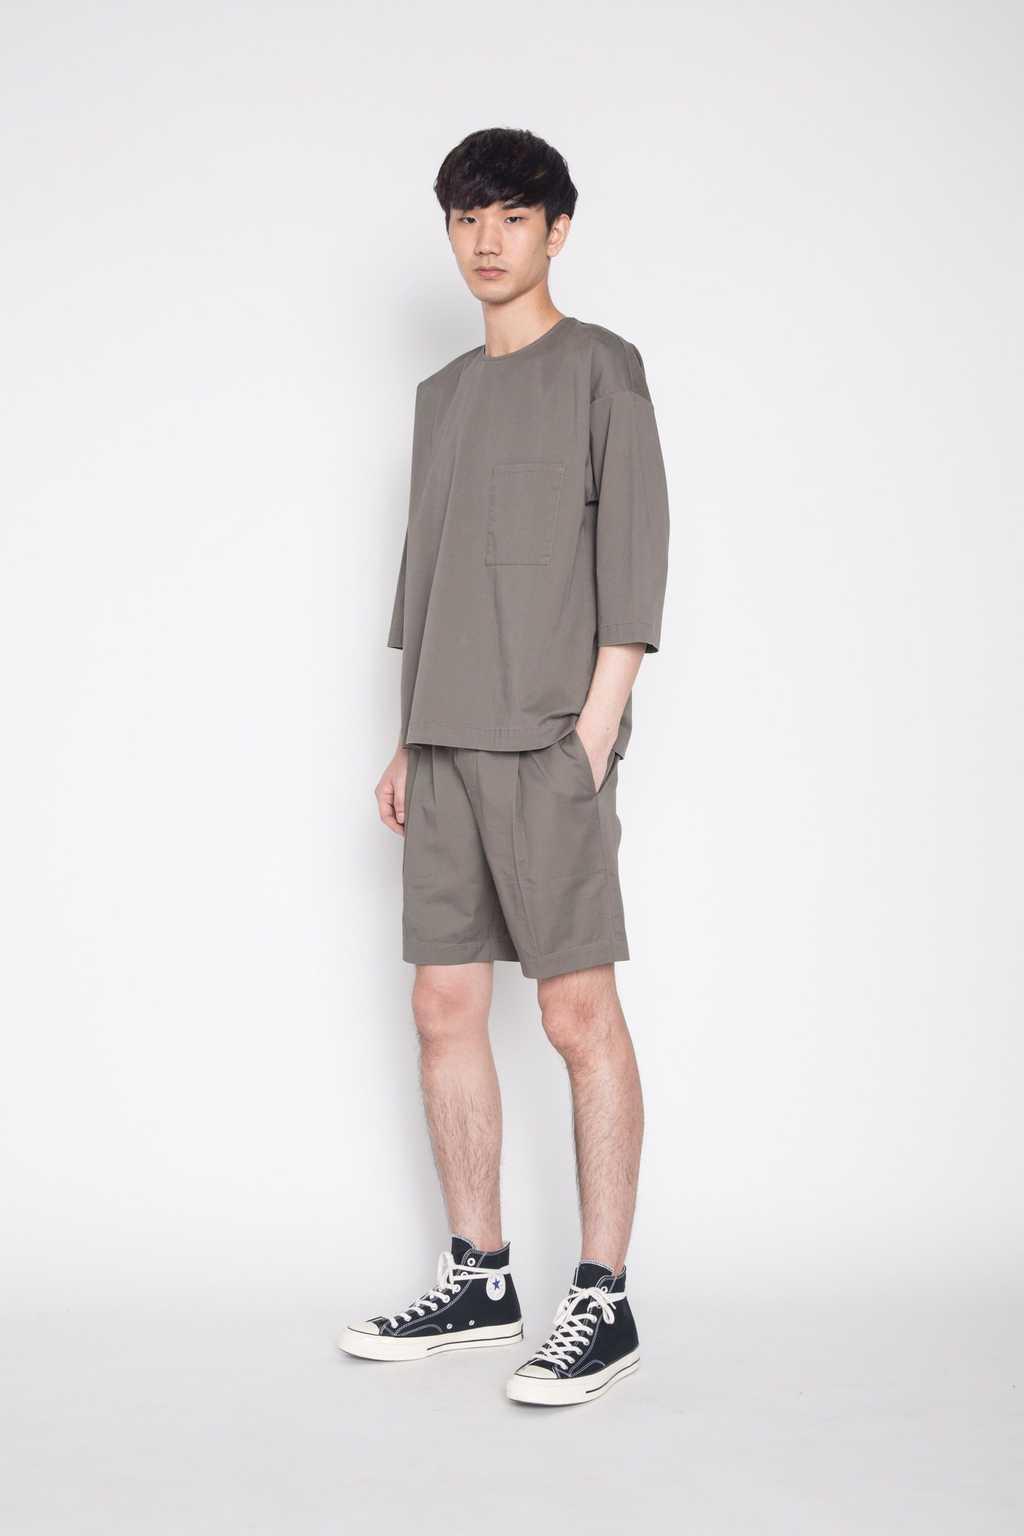 Shirt 1336 Olive 3